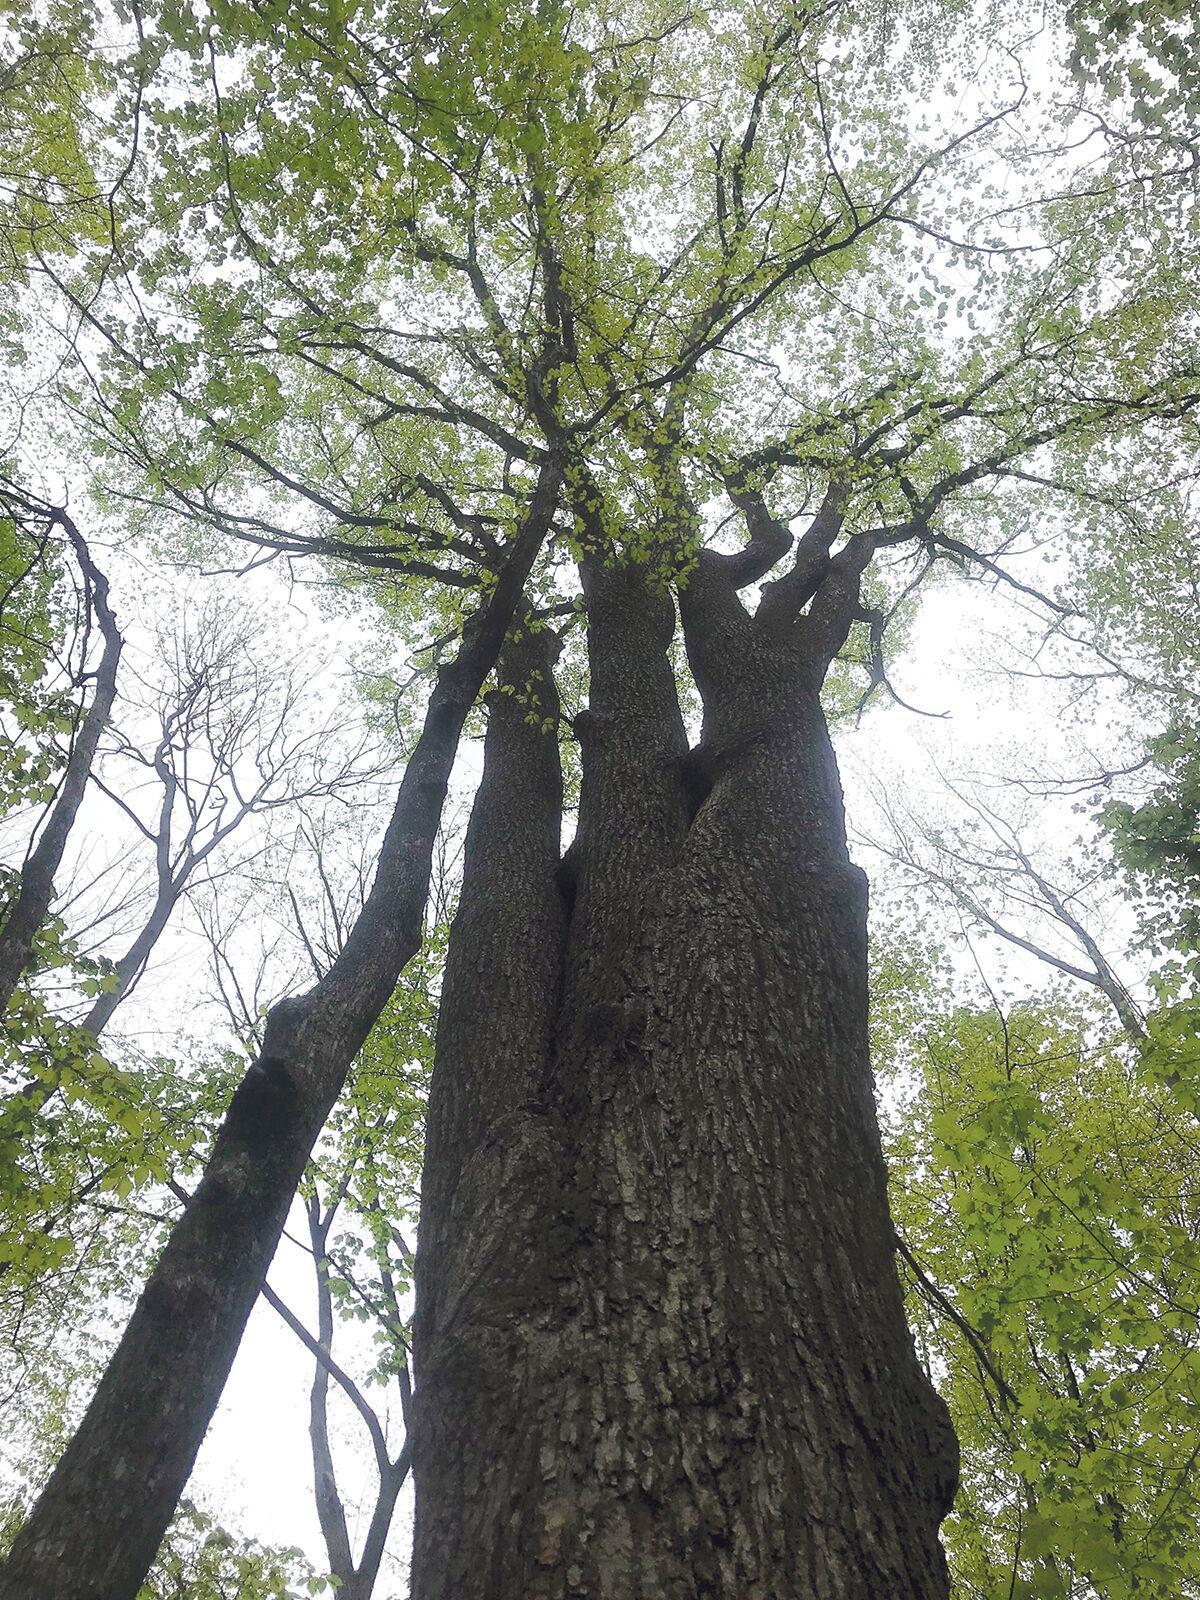 Forest communities create rich, complex legacies